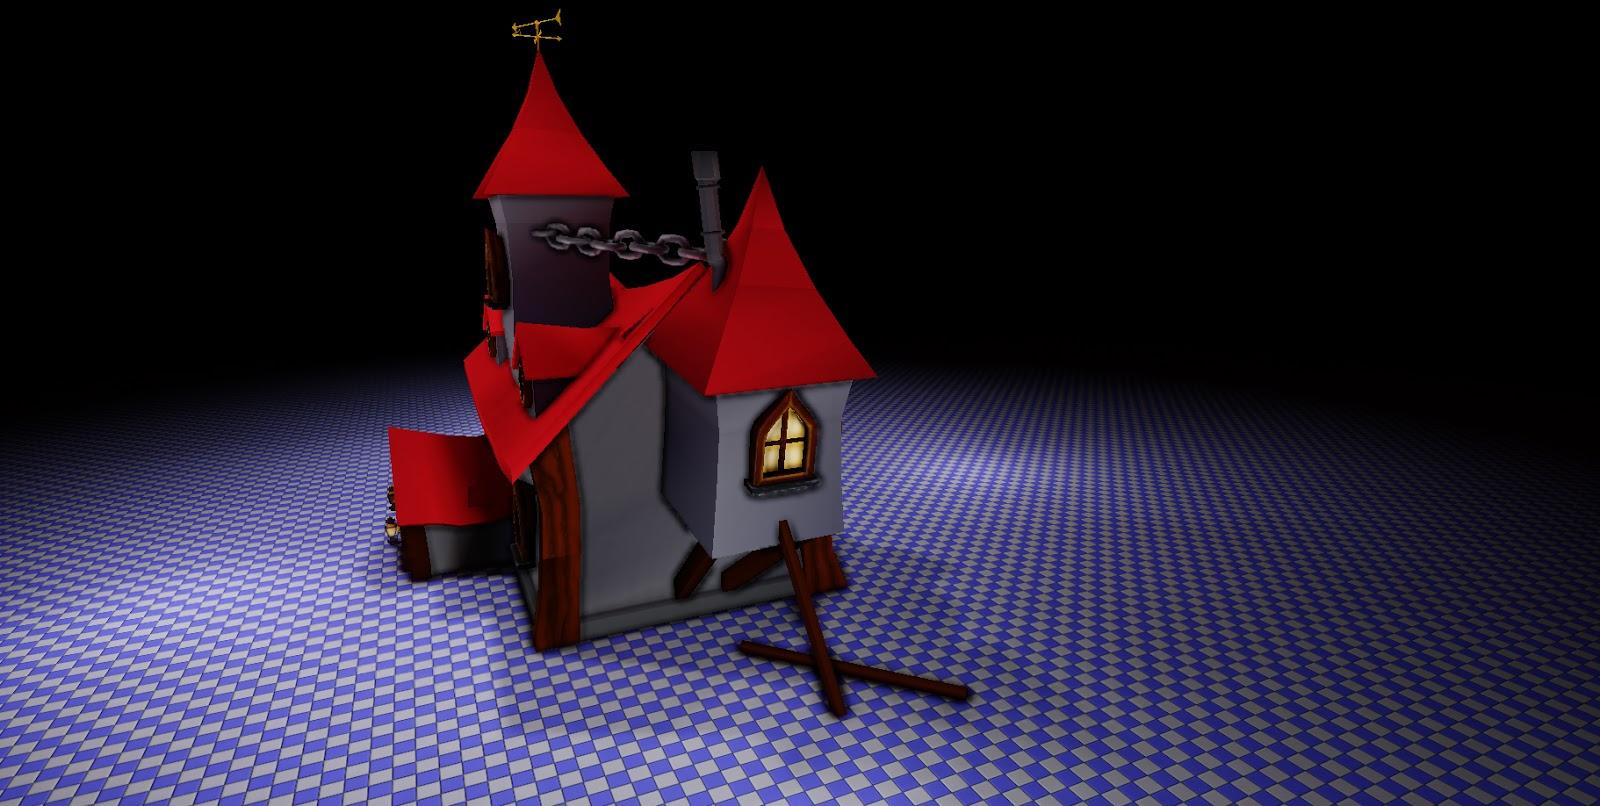 peter_Harries_UDK_house_texture2.jpg